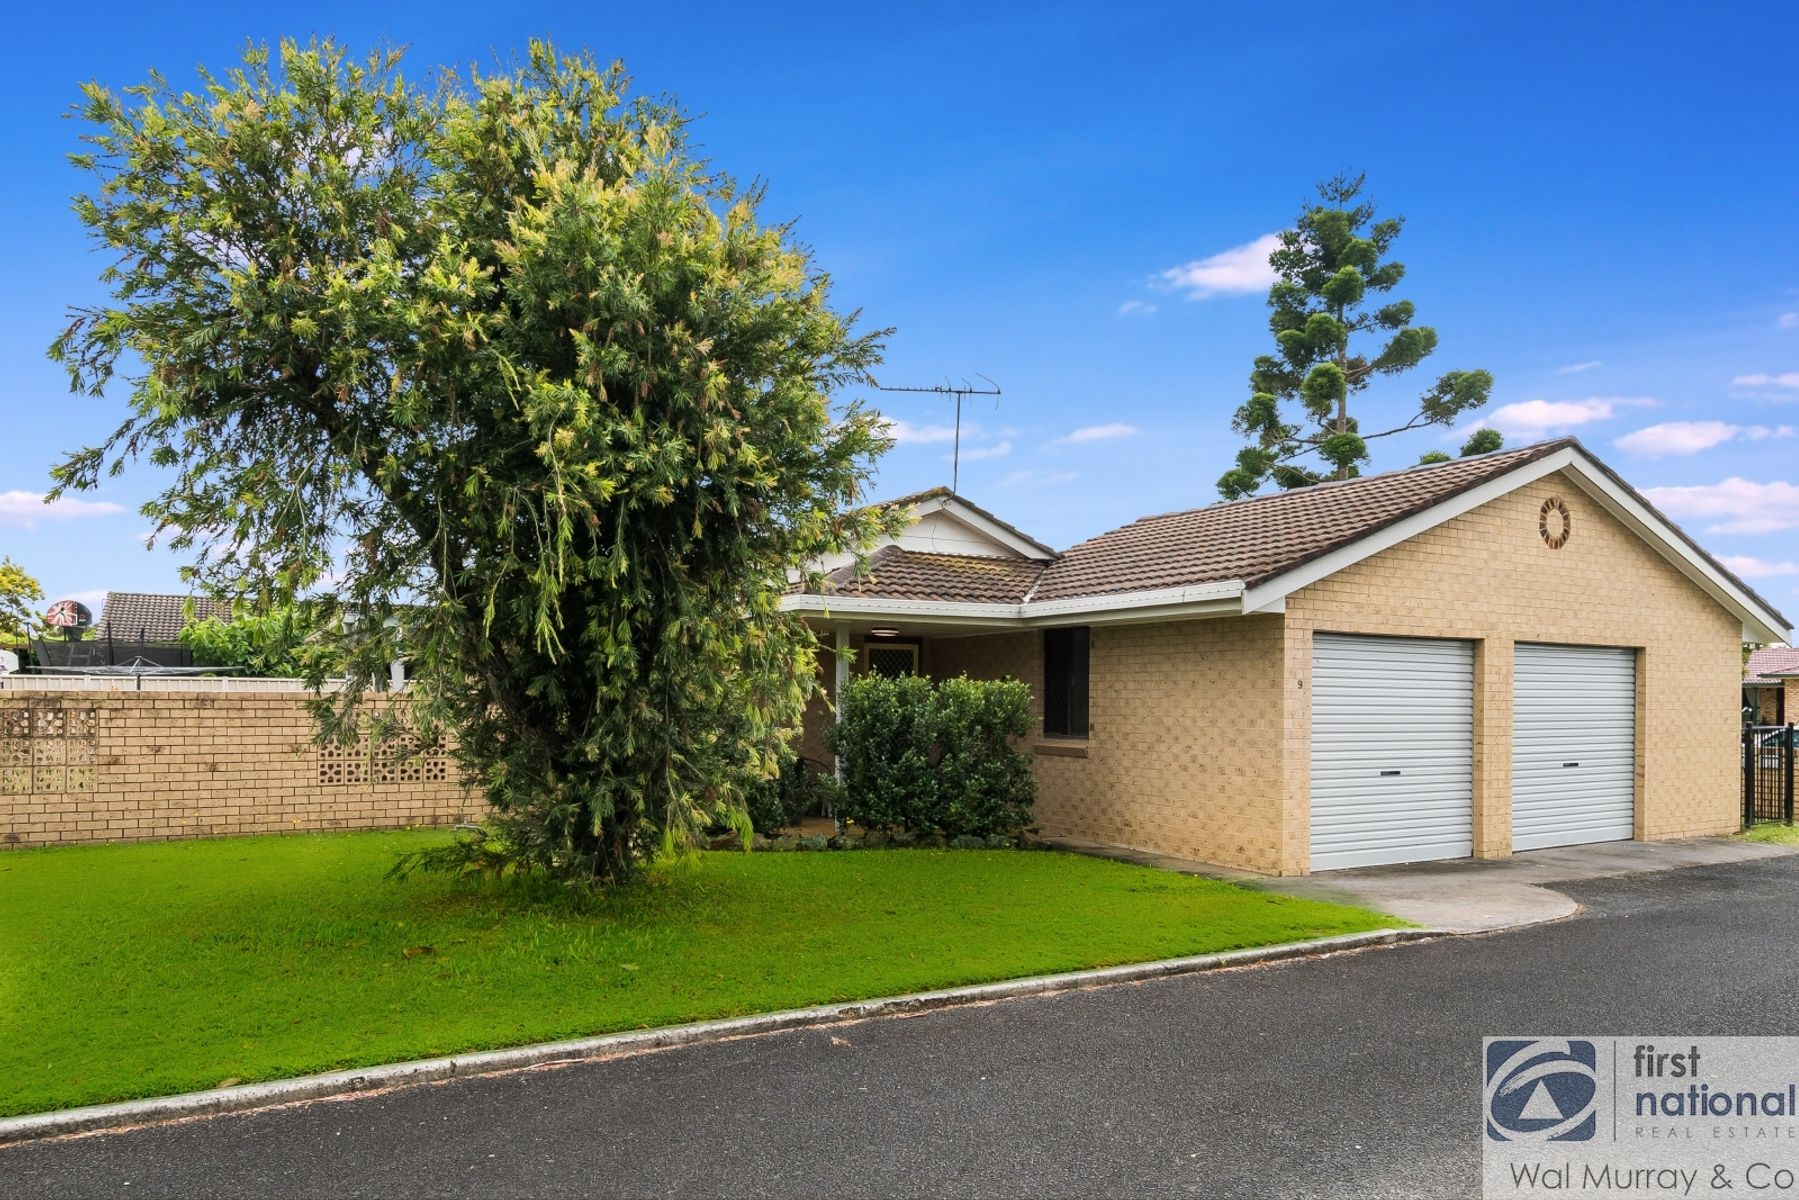 9/163 Fox Street, Ballina, NSW 2478